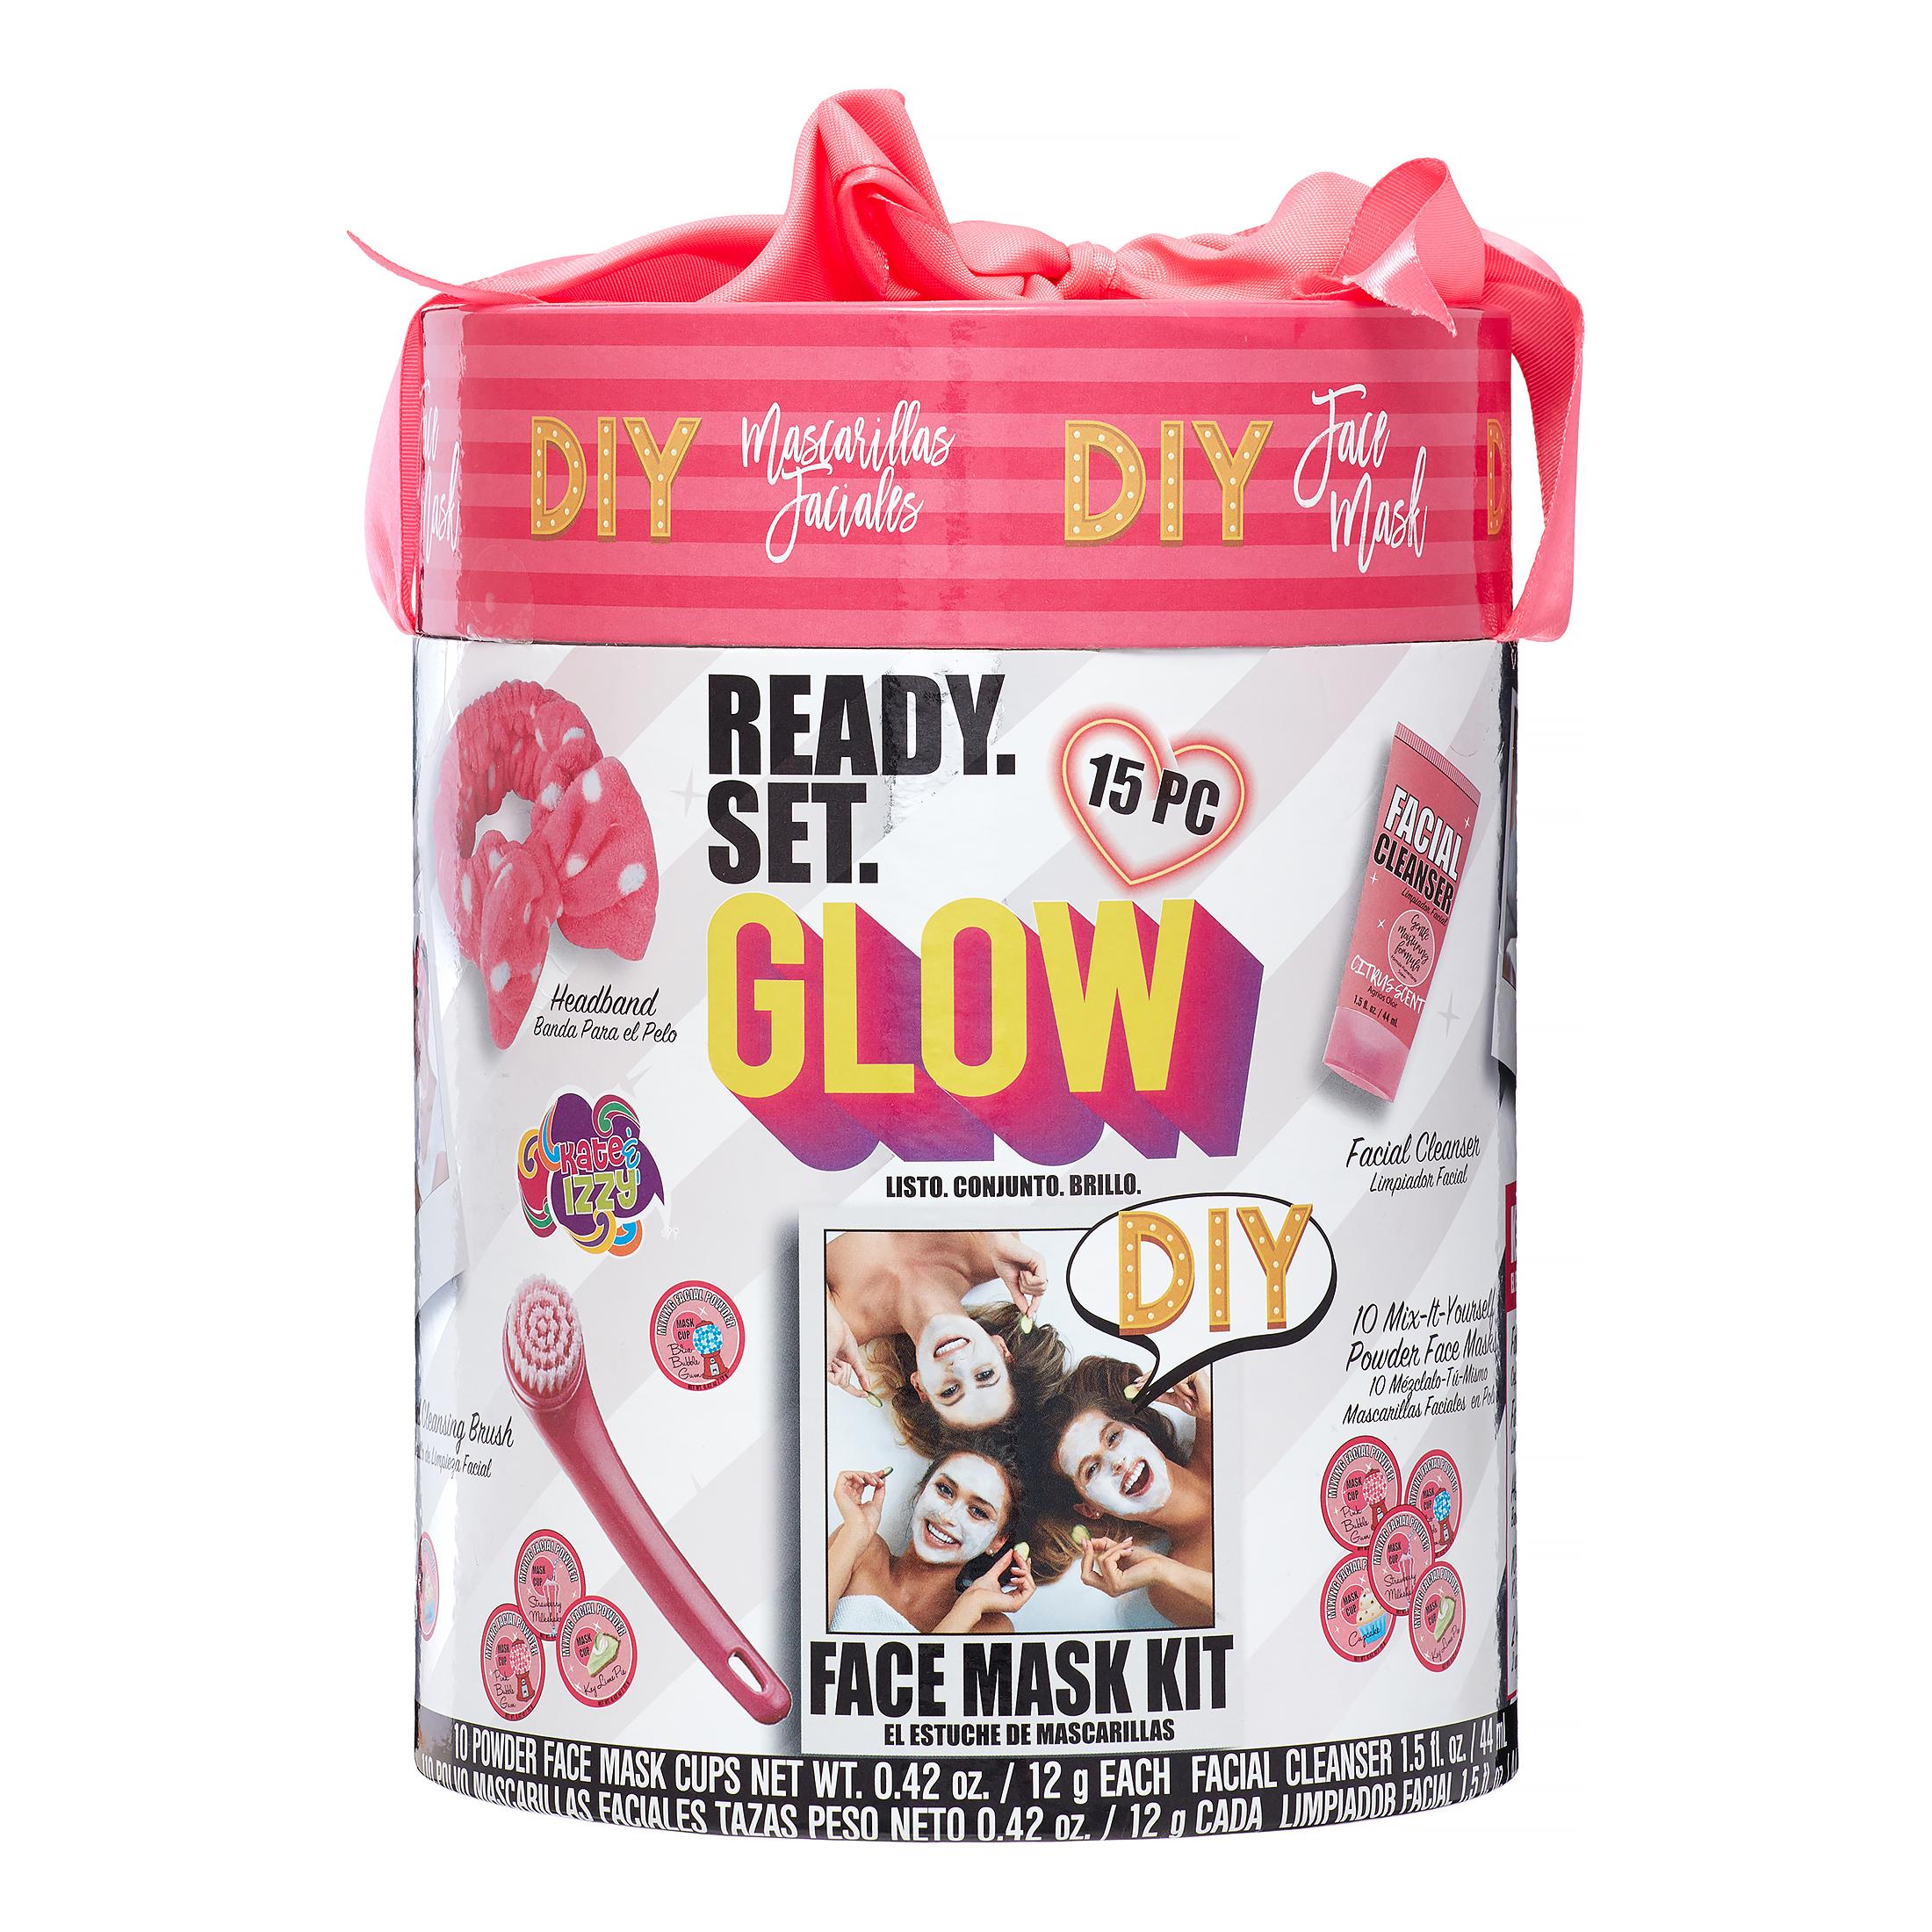 15 Pce Onyx Professional Ready Set Glow Diy Face Mask Gift